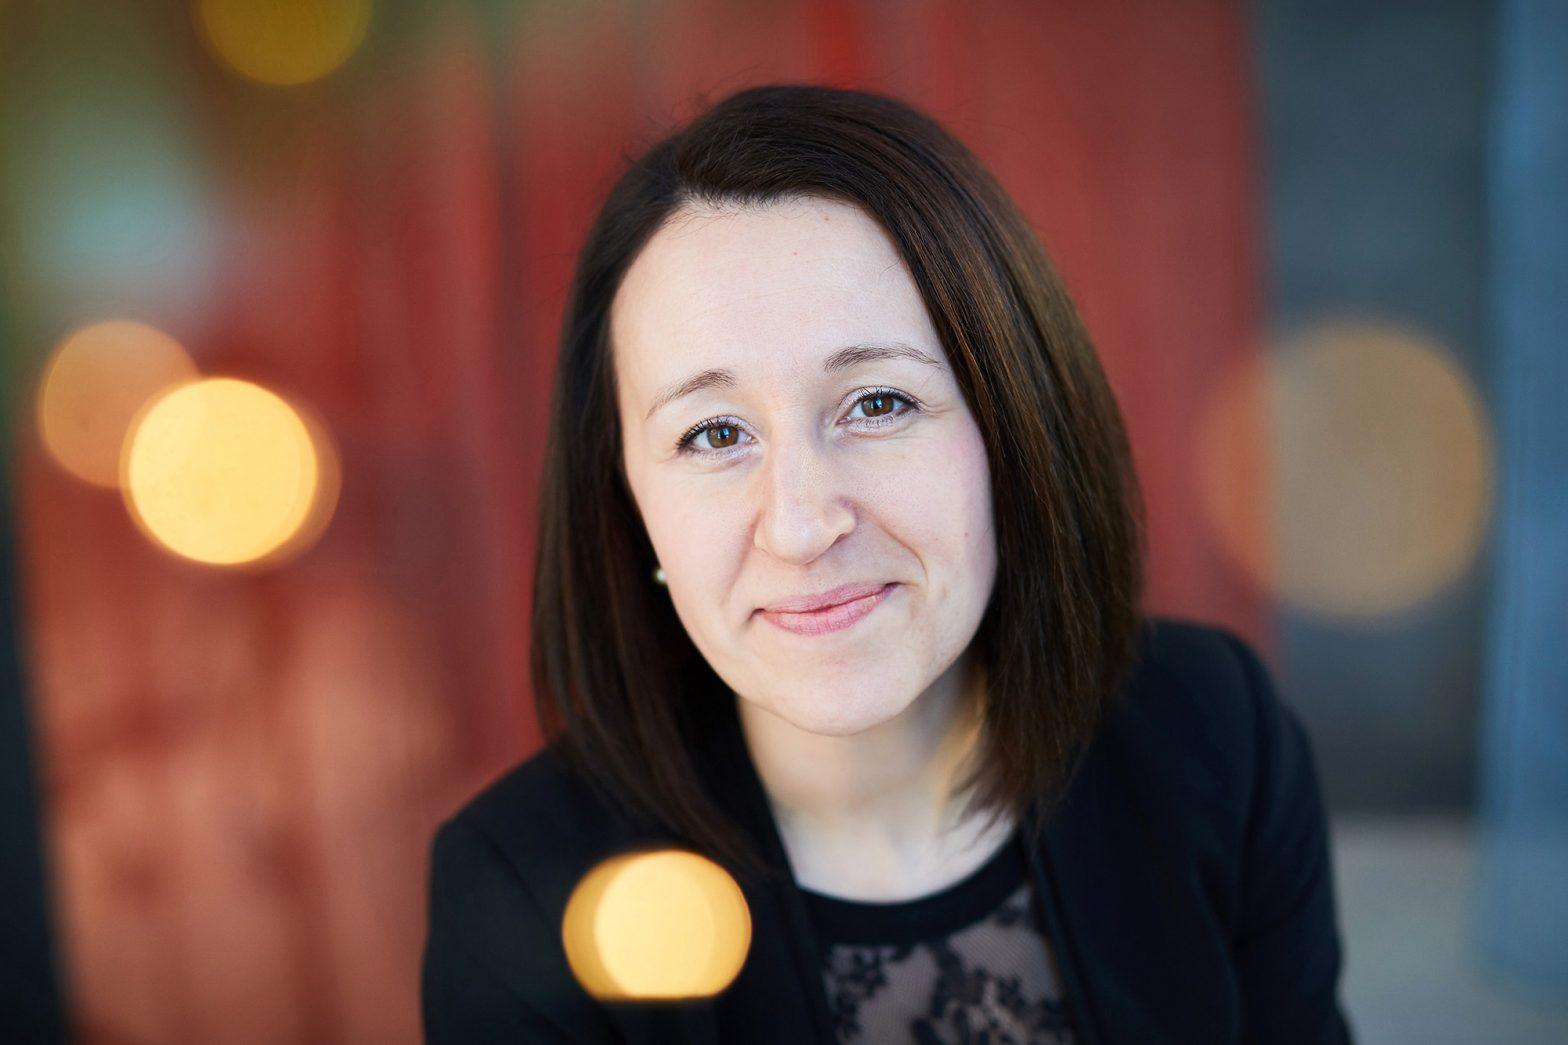 Amra Salihovic